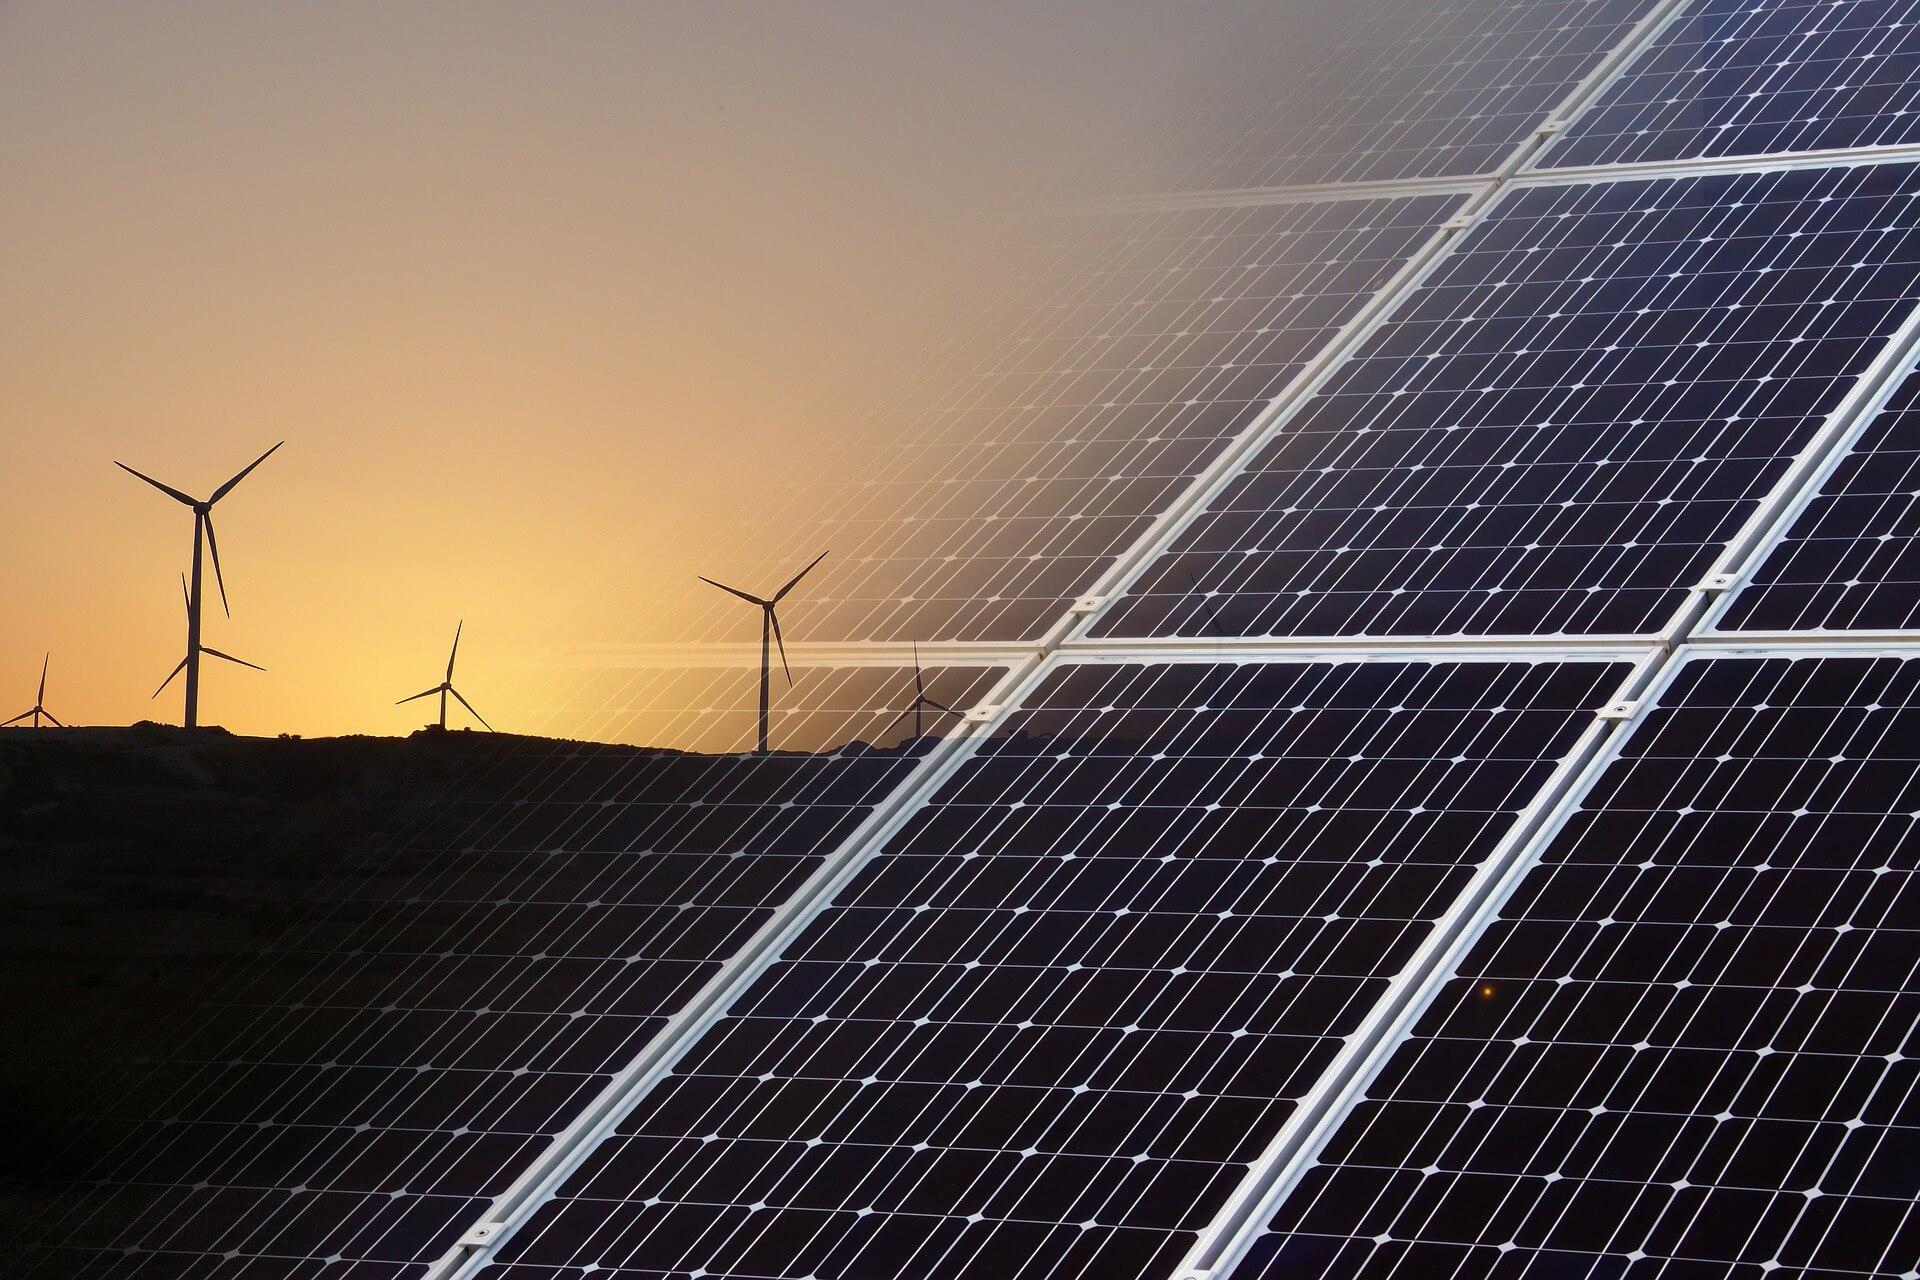 induction heating for renewable energy